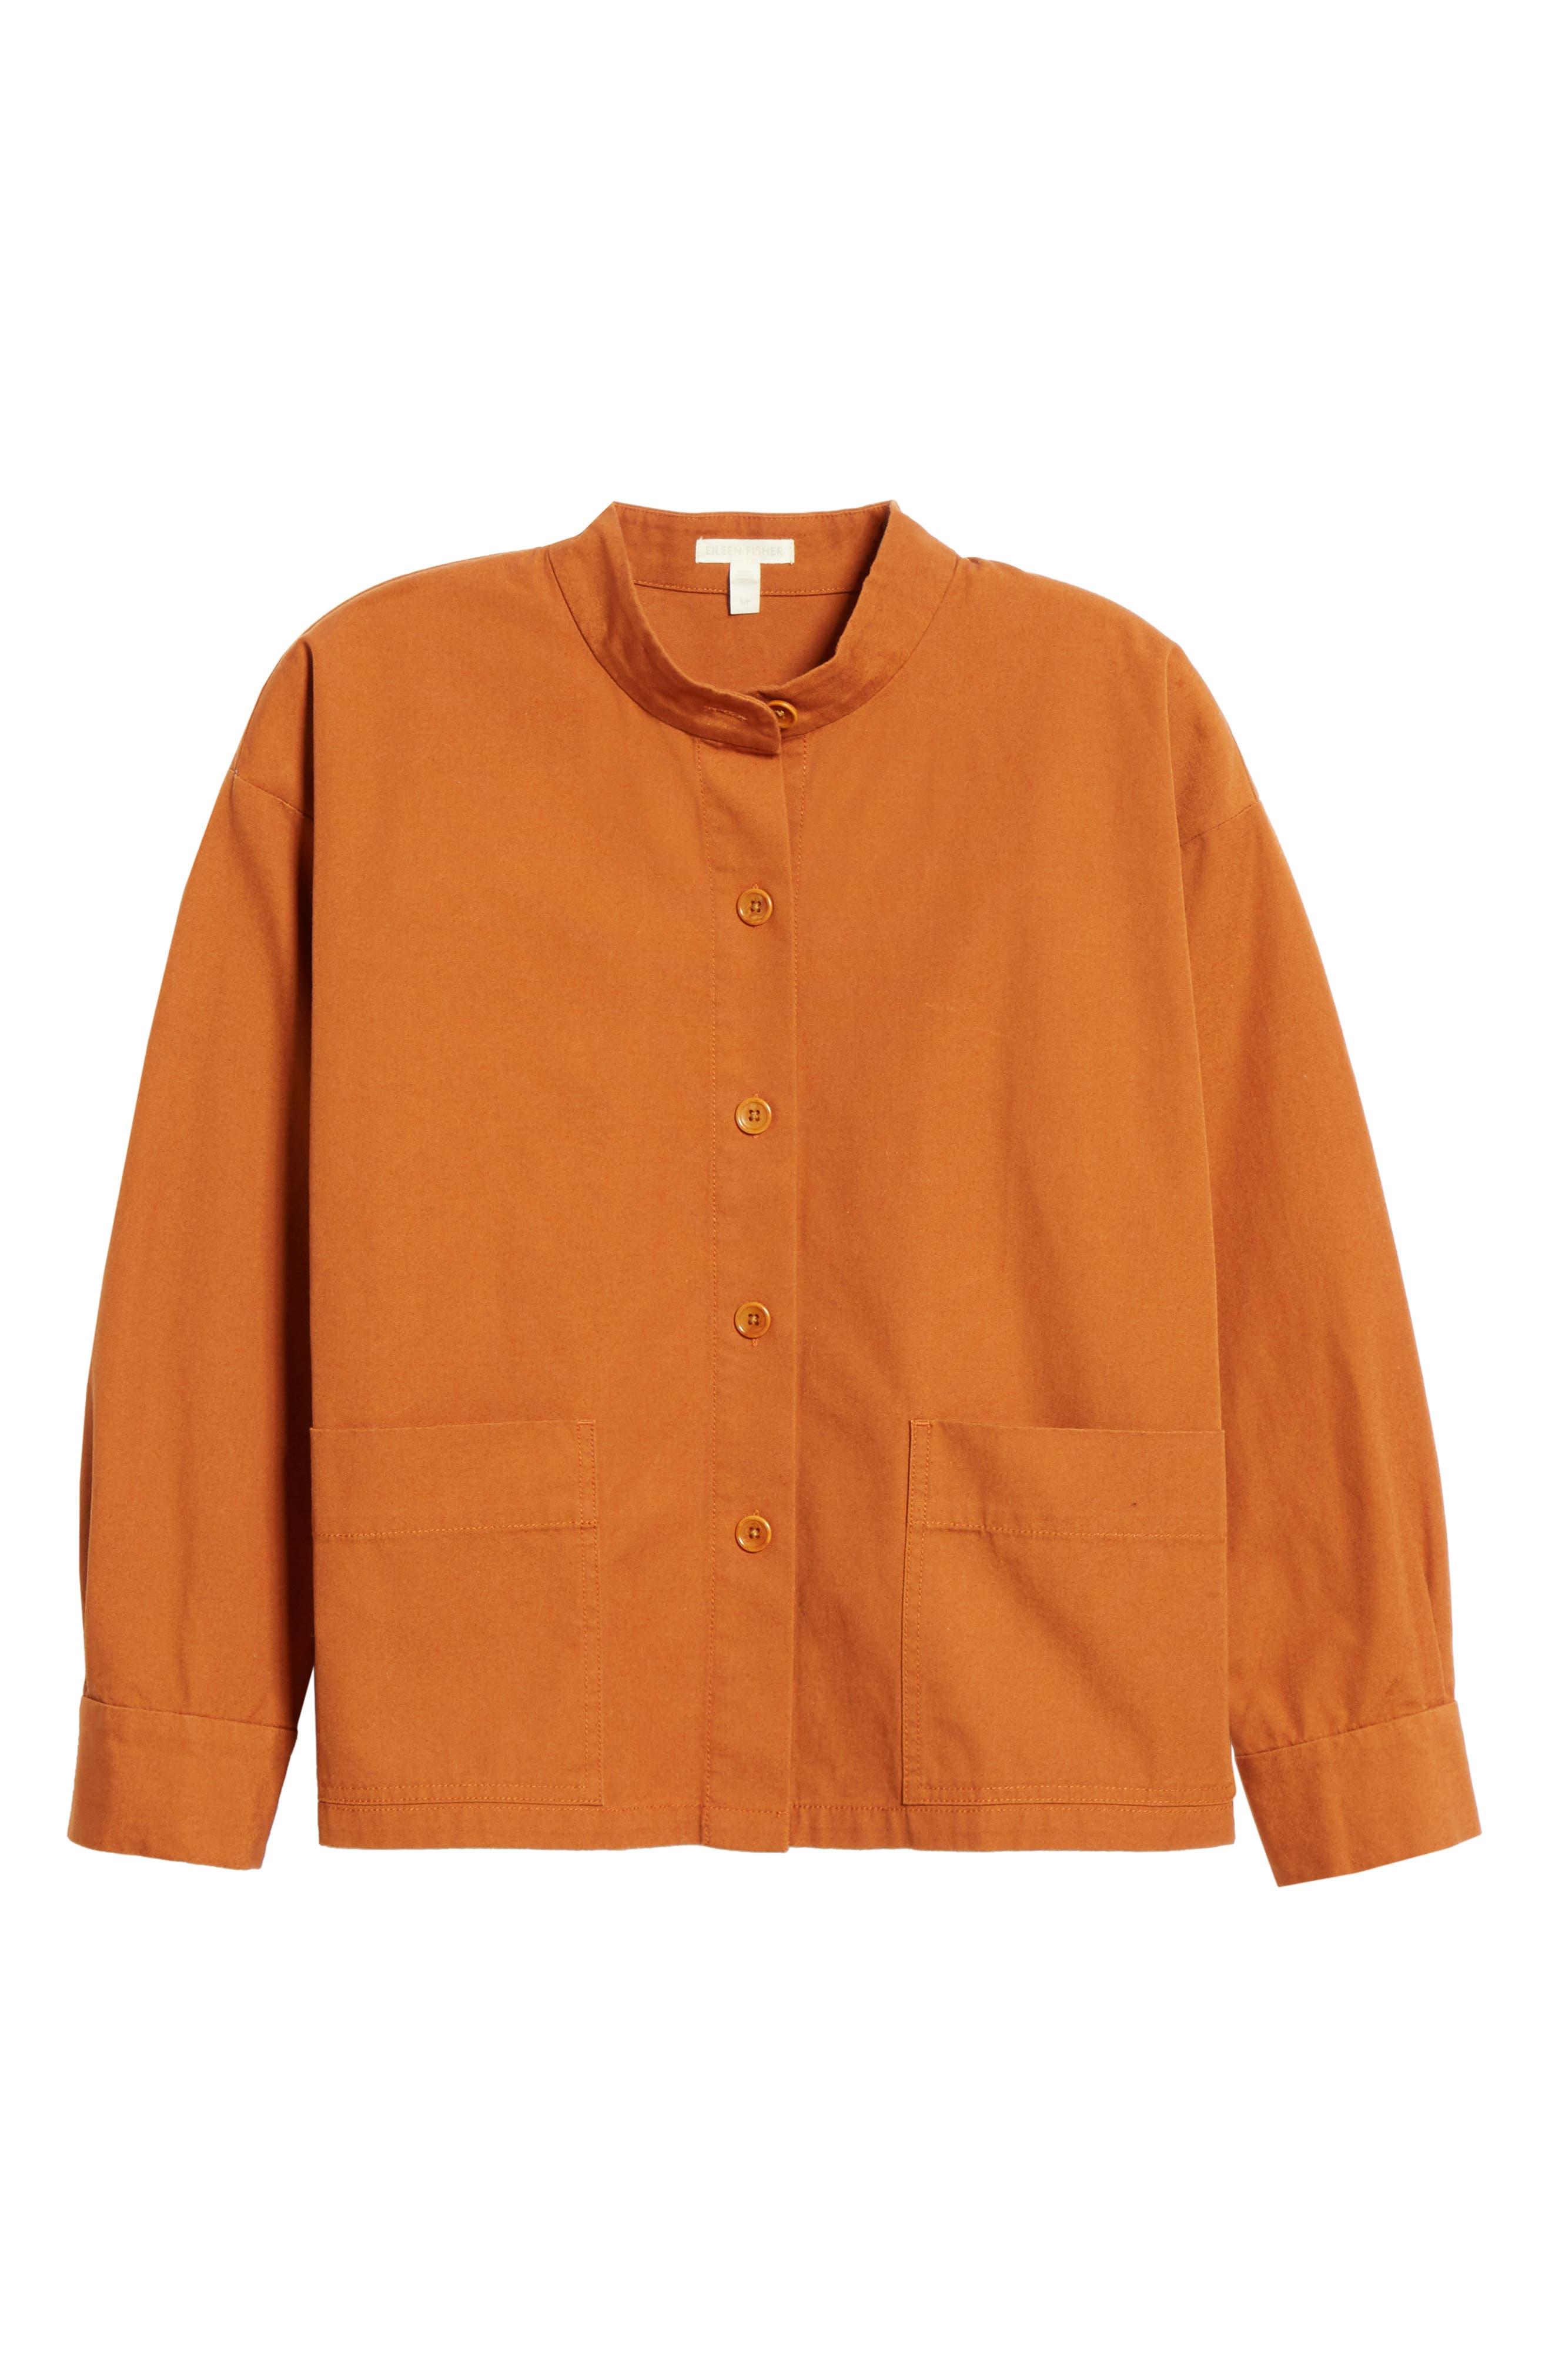 Organic Cotton Jacket,                             Alternate thumbnail 6, color,                             MUSK